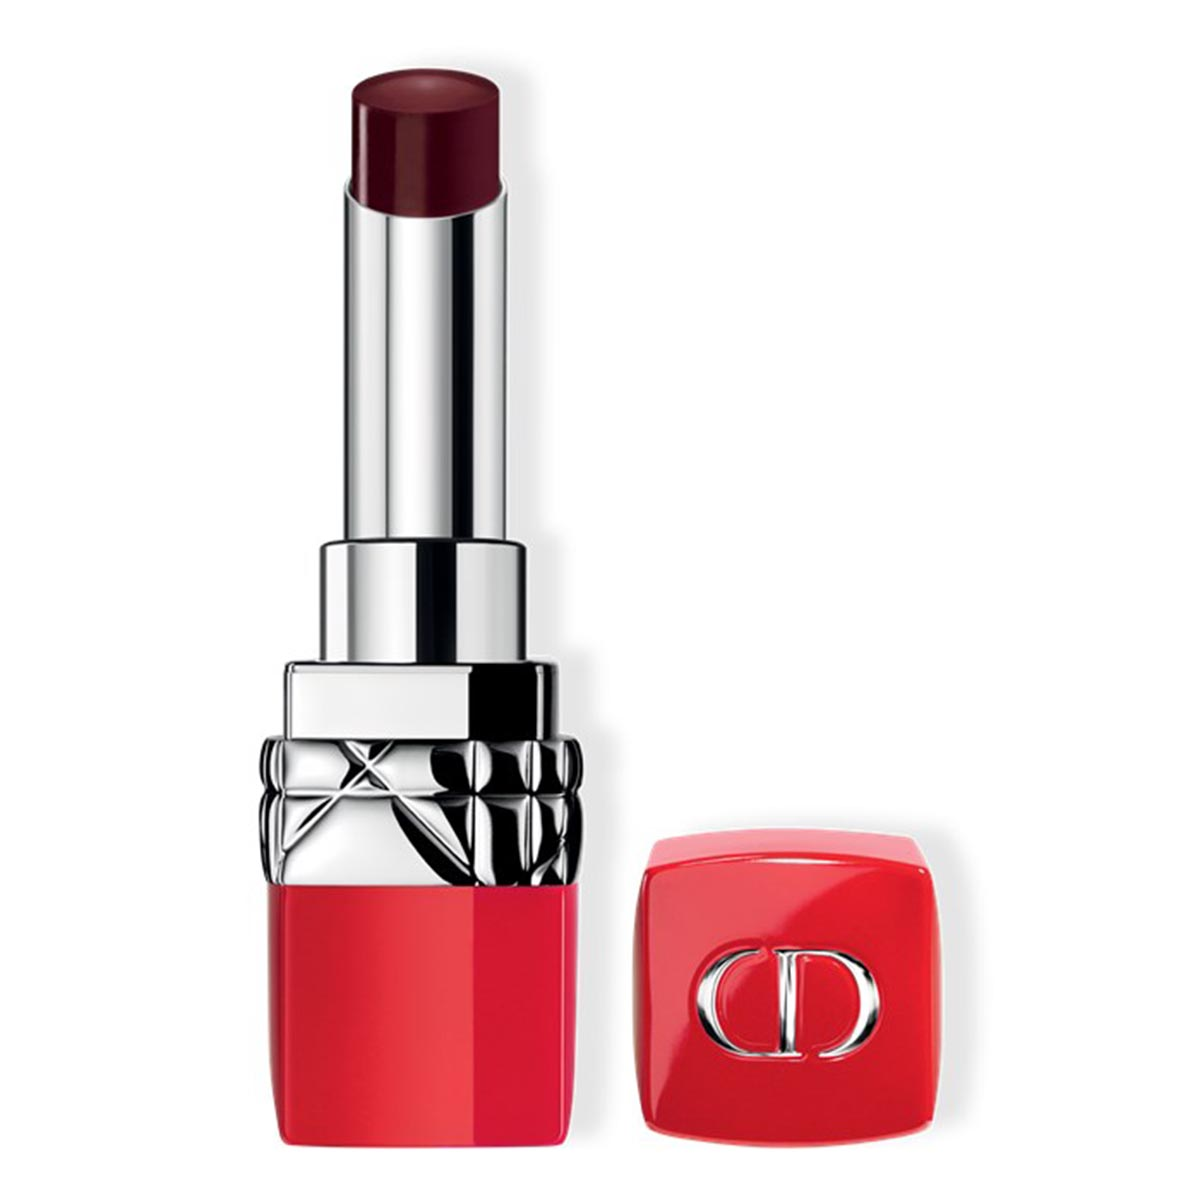 Dior rouge dior lipstick 986 ultra radical